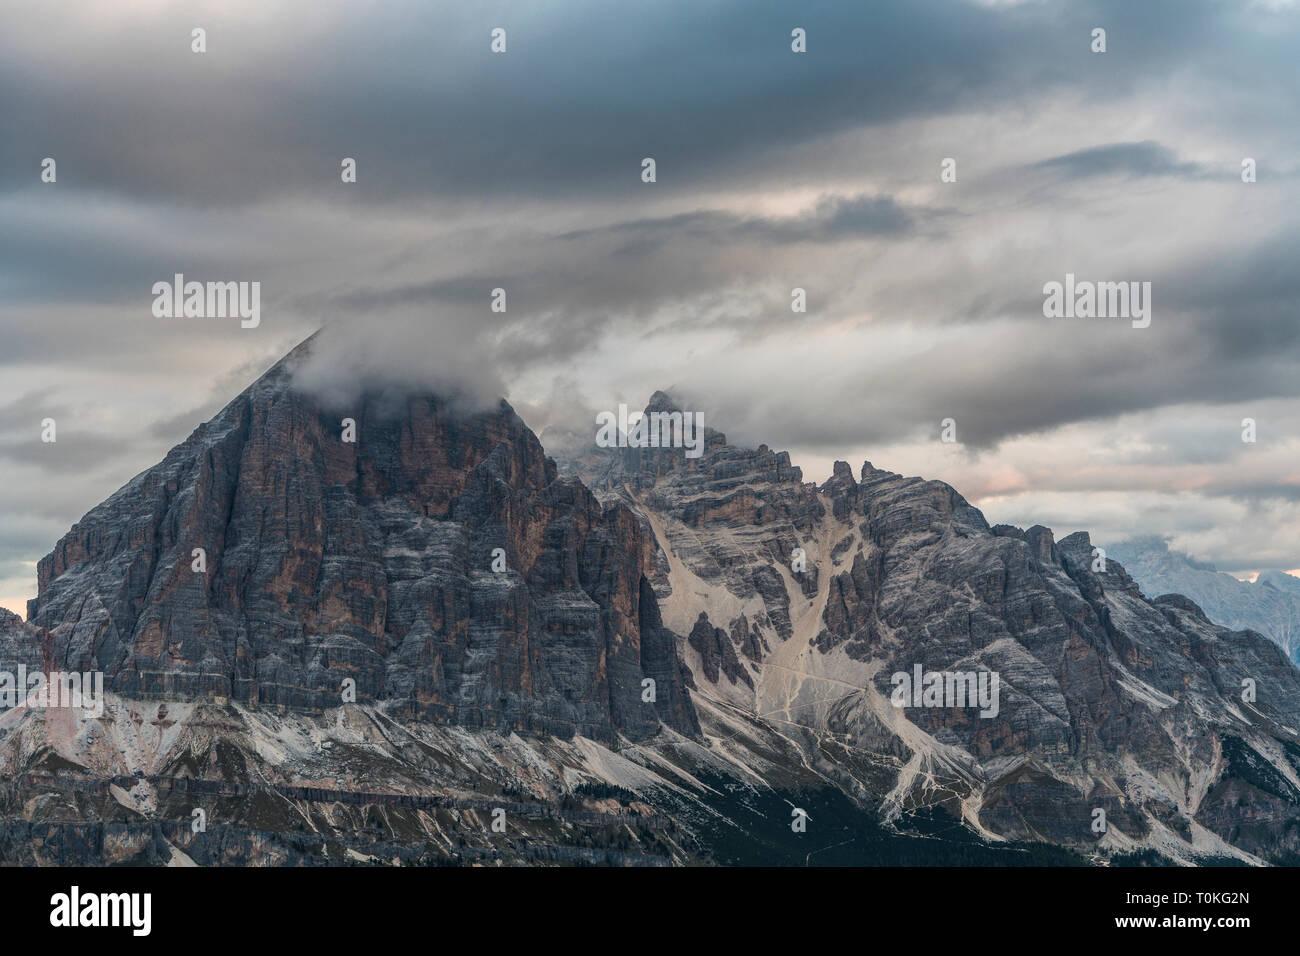 Amanecer en los Dolomitas en Rifugio Nuvolau domina la Tofane, Italia Foto de stock